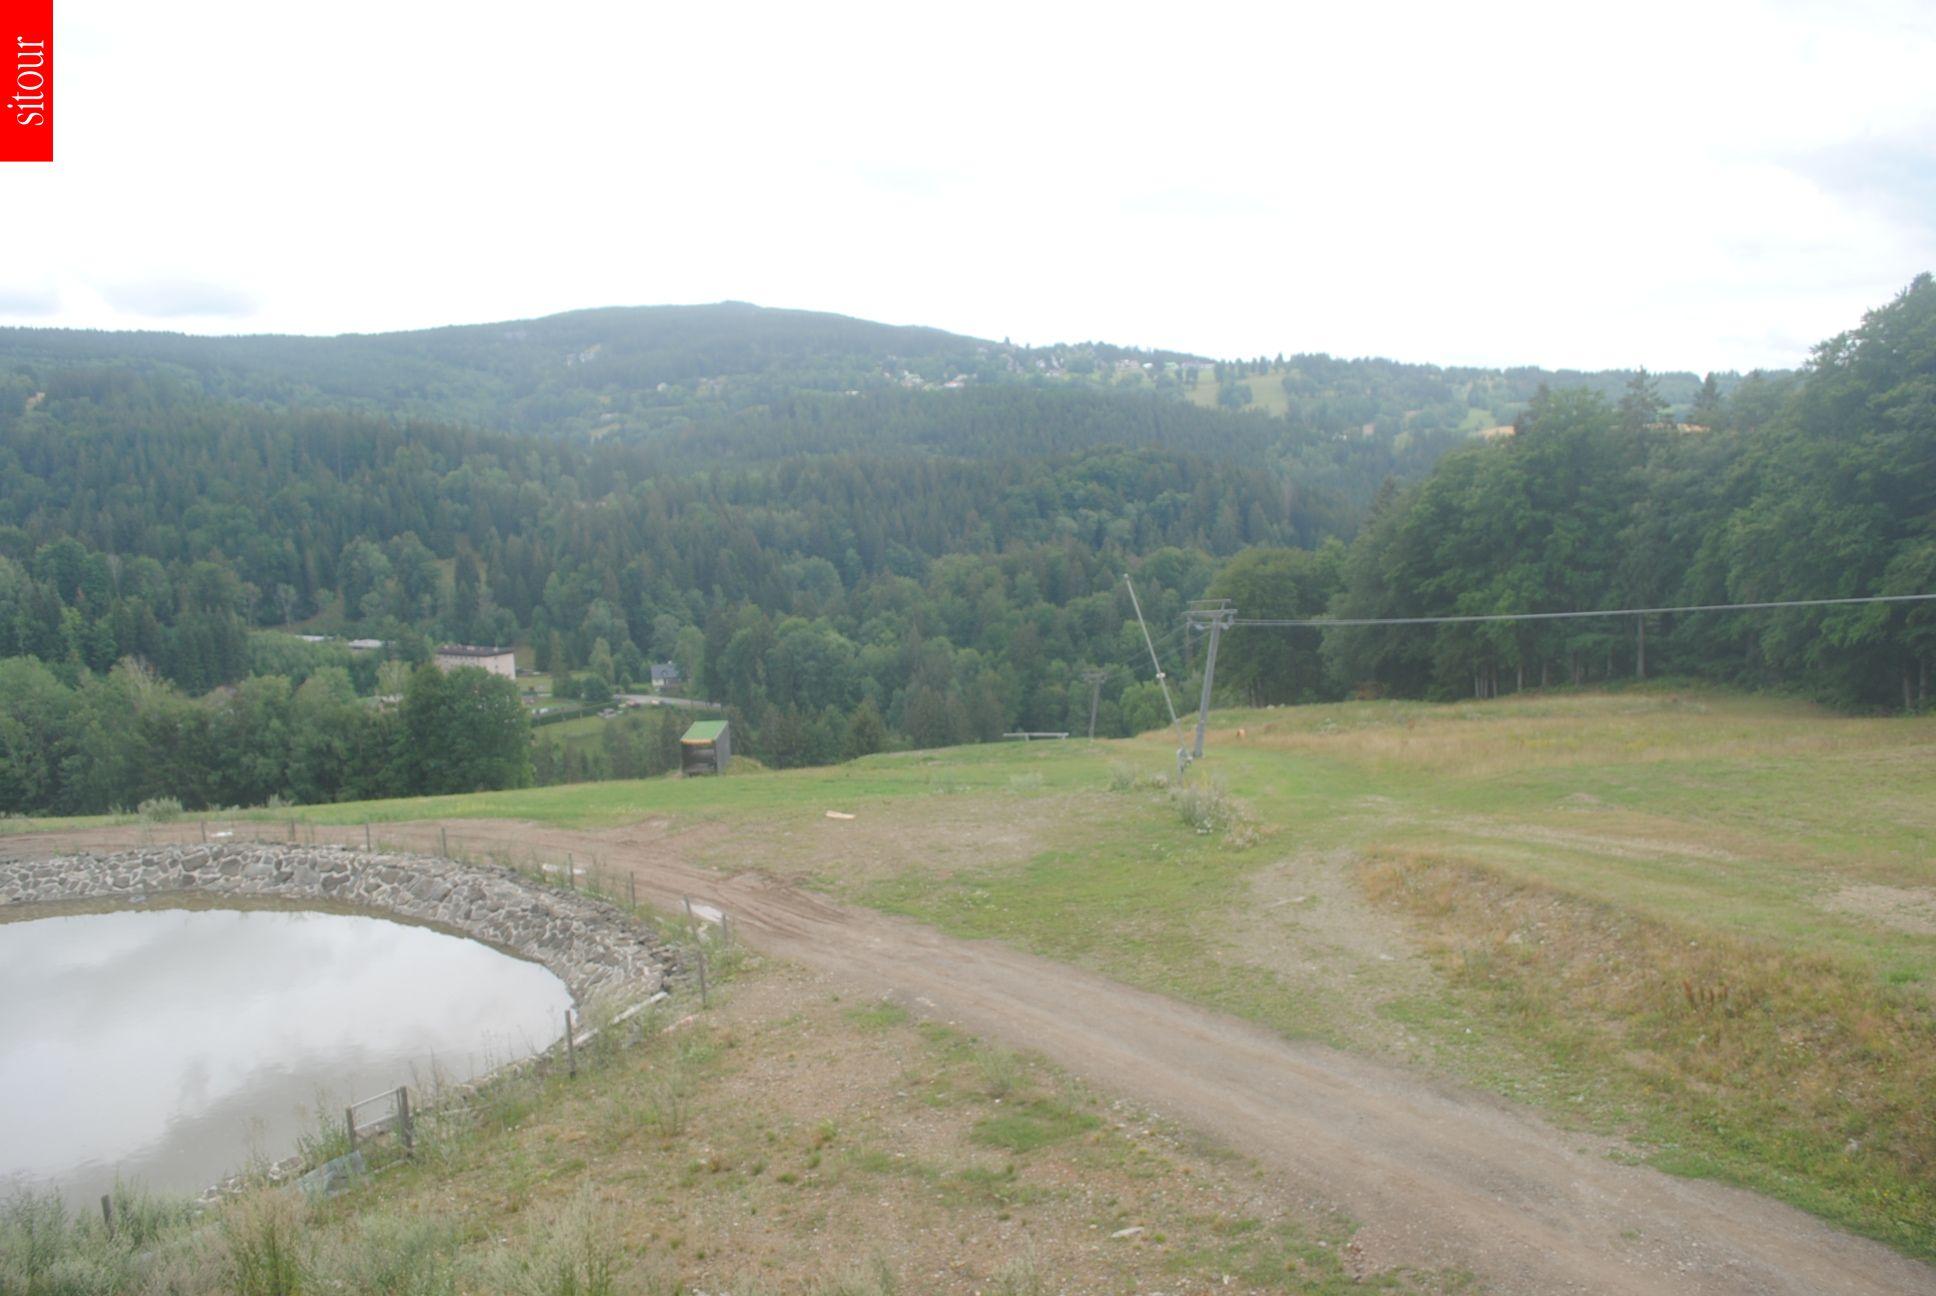 Webcam Skigebiet Vitkovice cam 3 - Riesengebirge